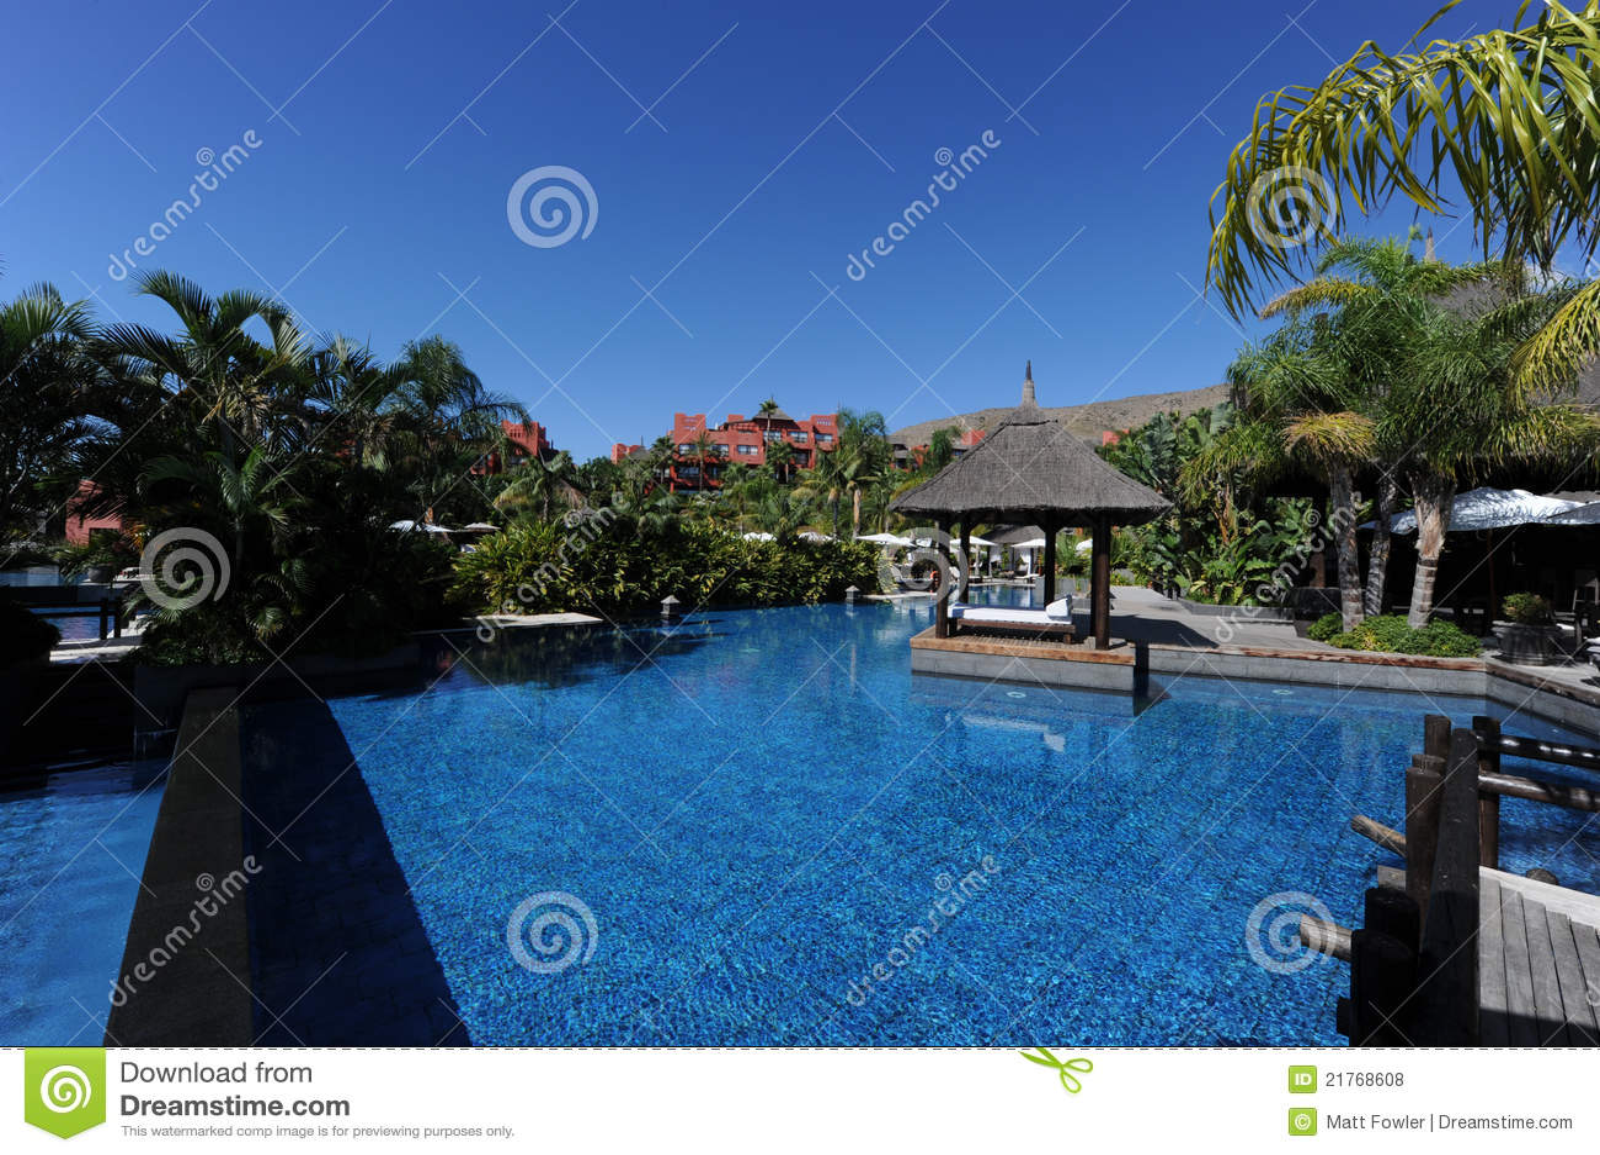 Asia gardens hotel benidorm spain stock photo image - Hotel benidorm asia garden ...